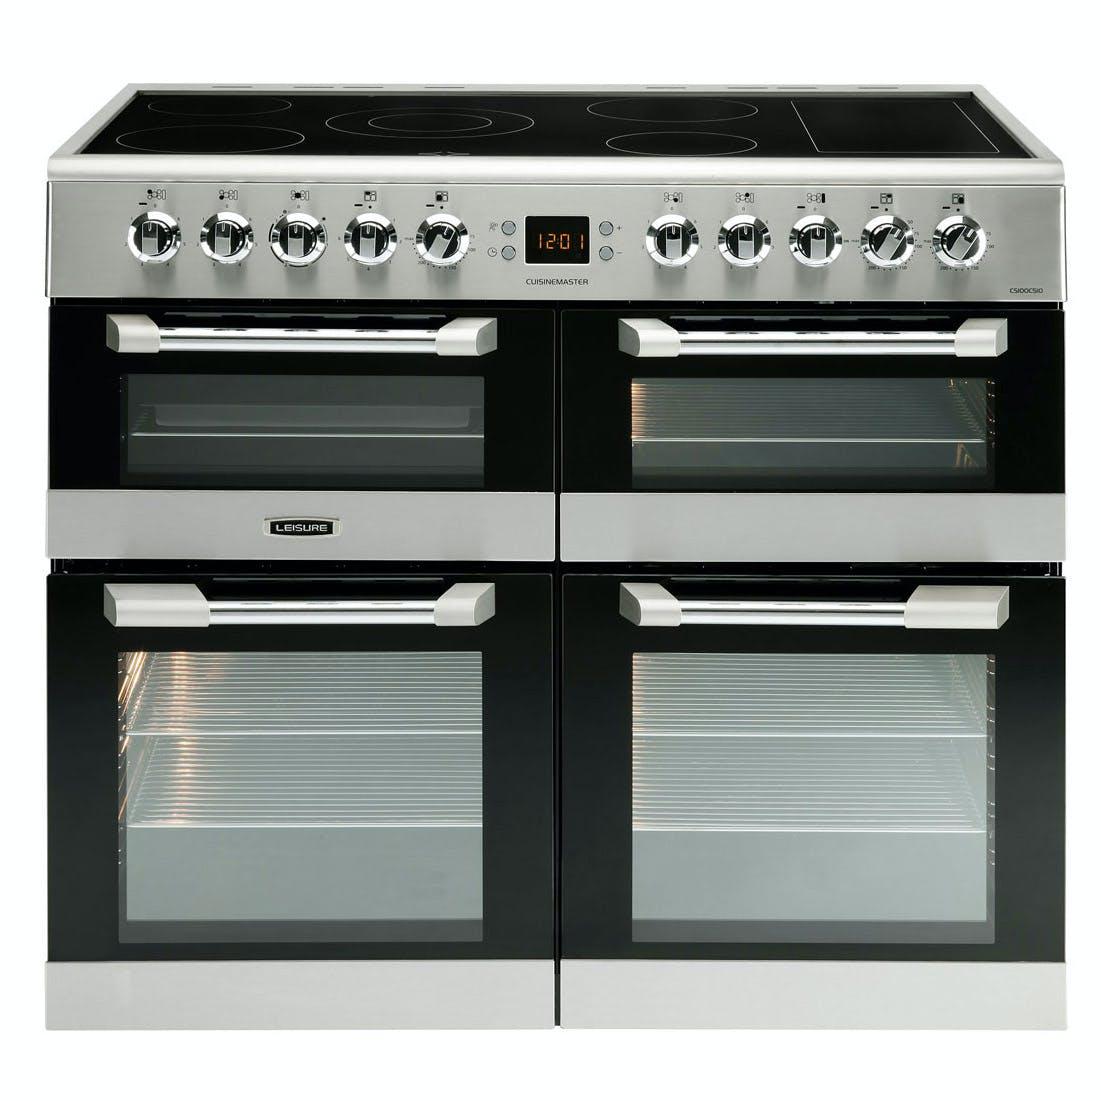 Leisure Cs100c510x 100cm Cuisinemaster Electric Range